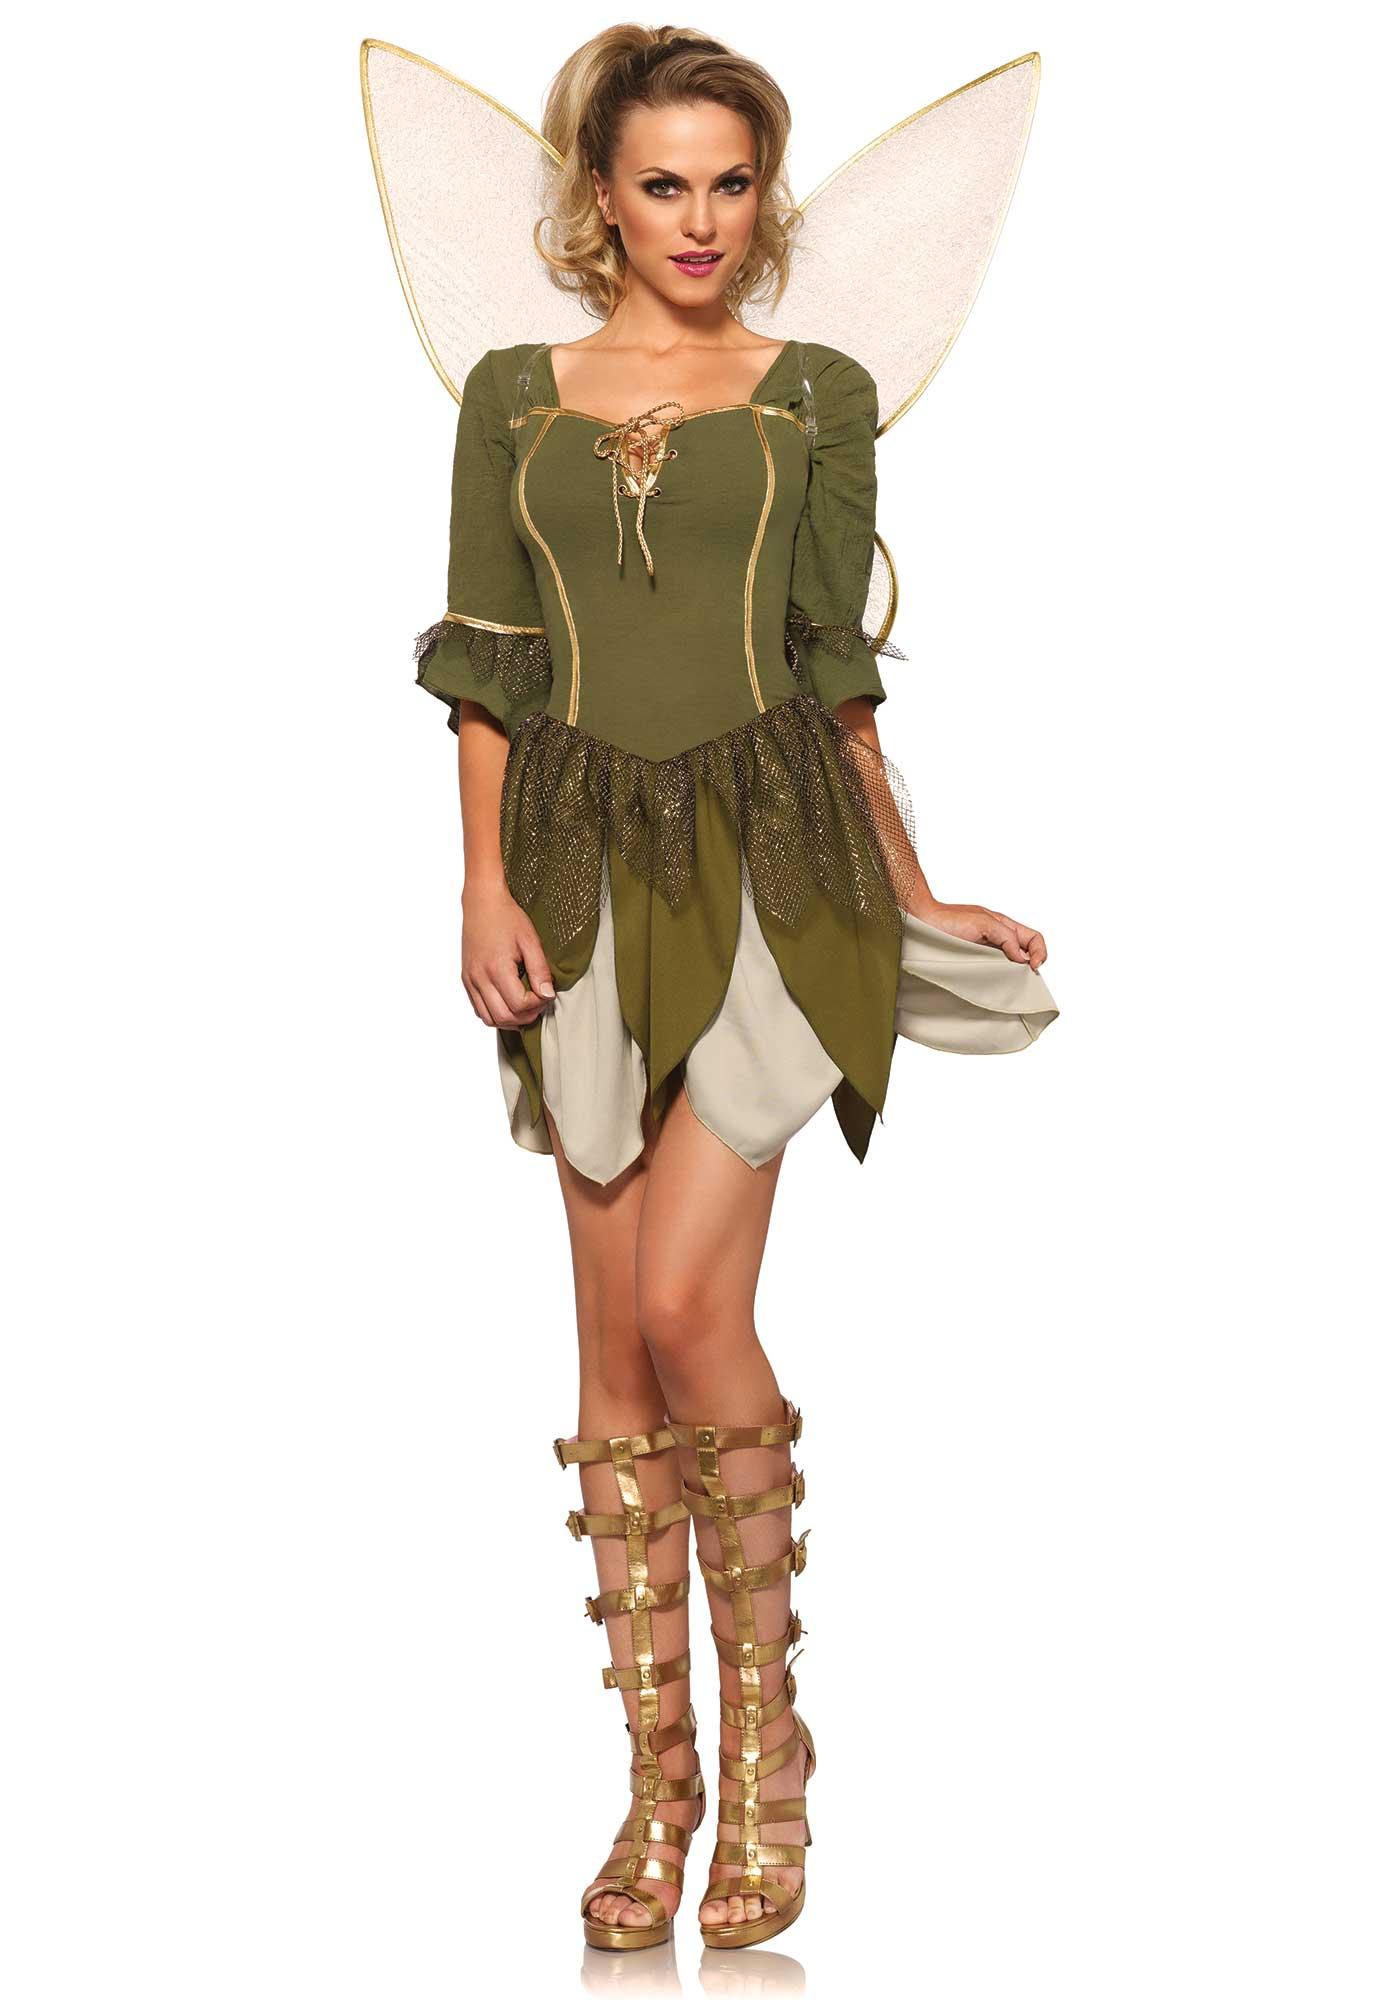 Fee Kostuum Dames.Groen Bos Feeen Kostuum Voor Vrouwen